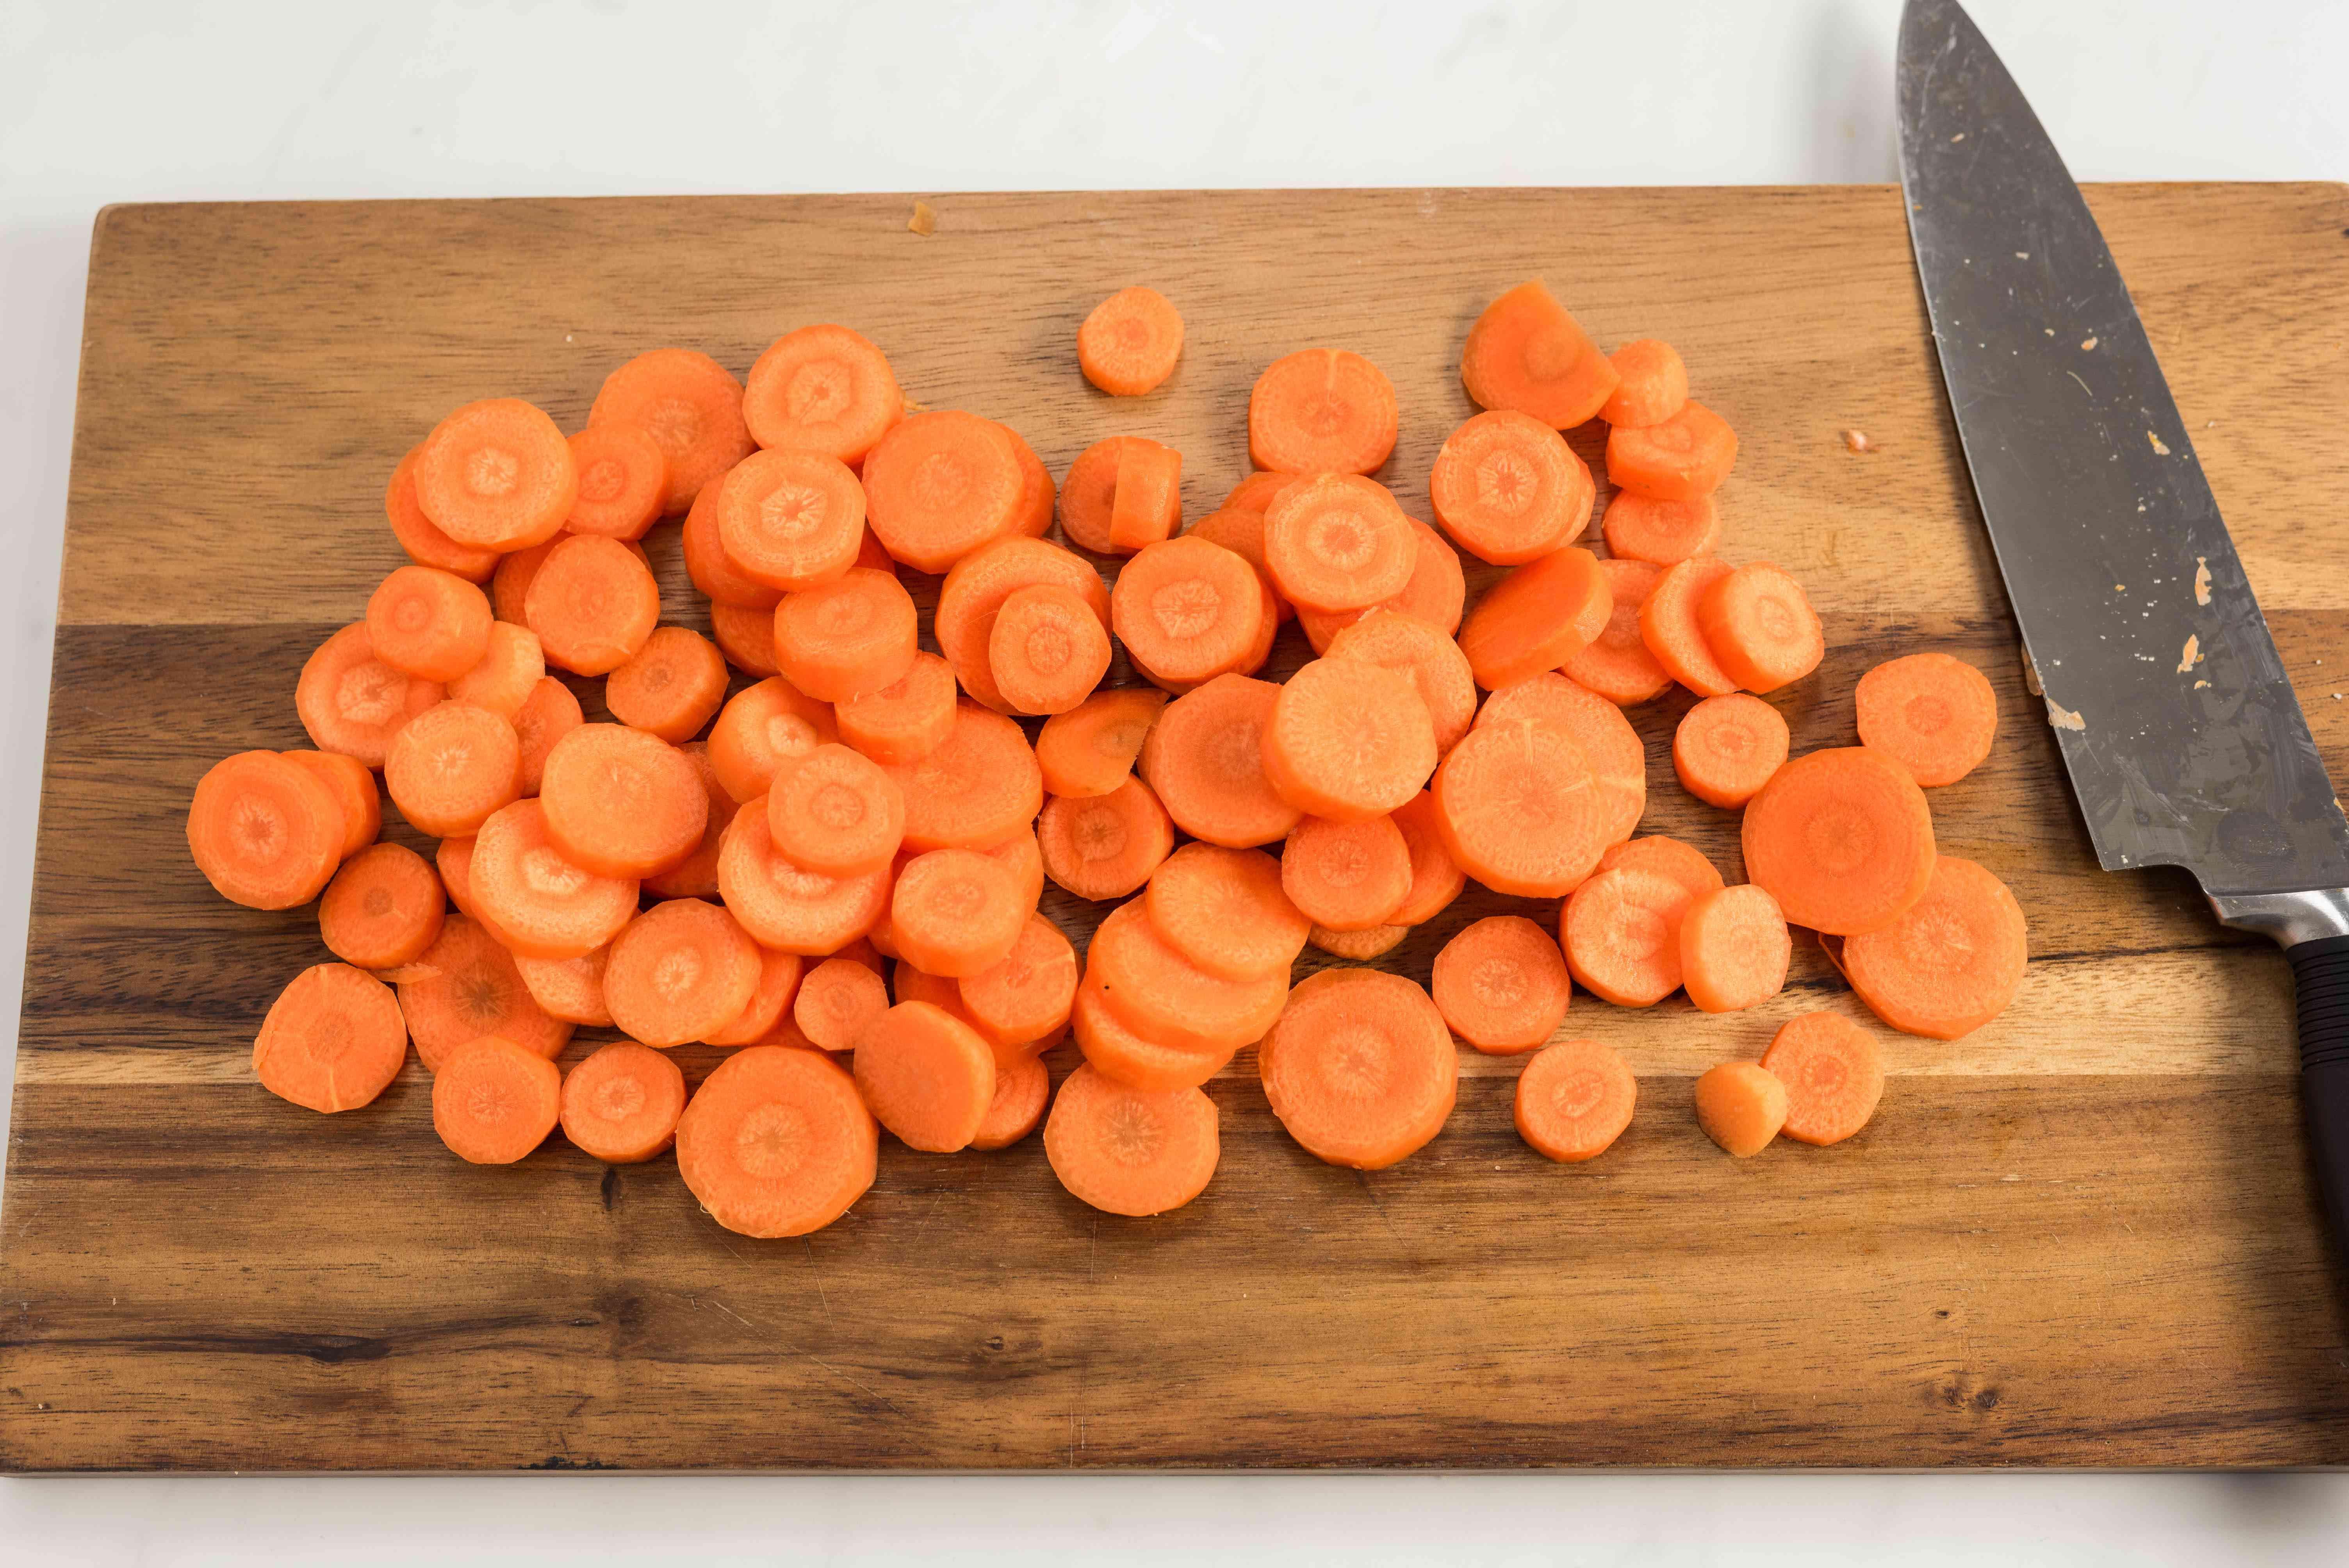 Peel carrots